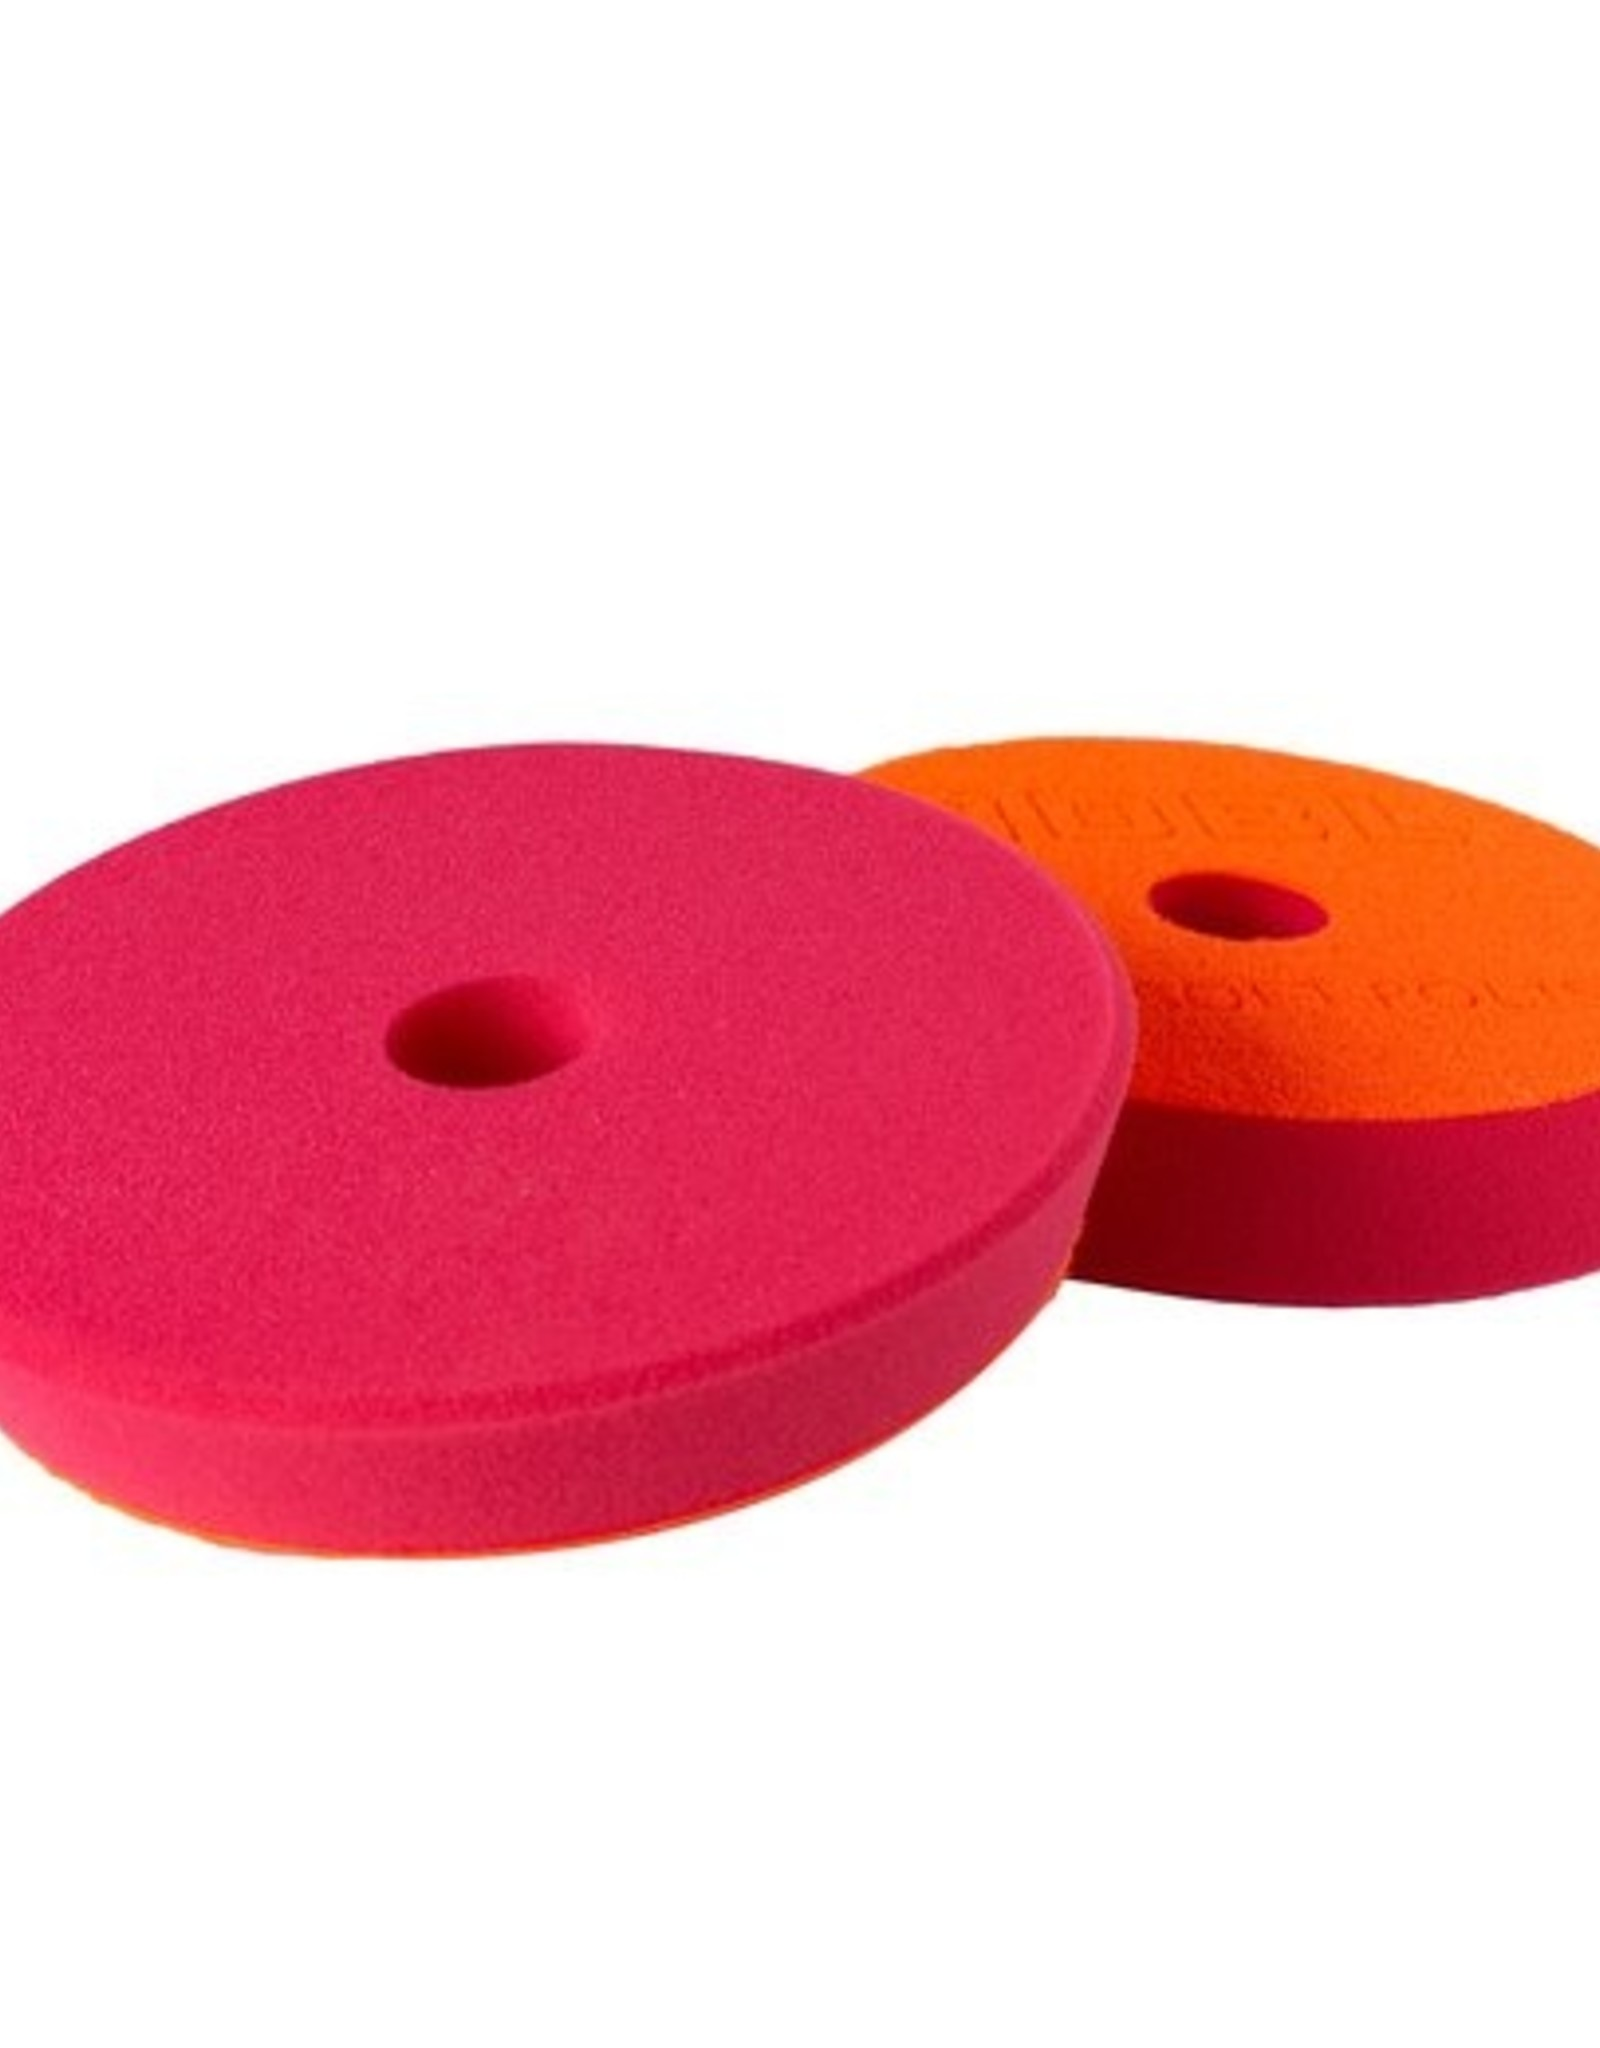 ADBL Roller Pad DA Soft Polish 150mm